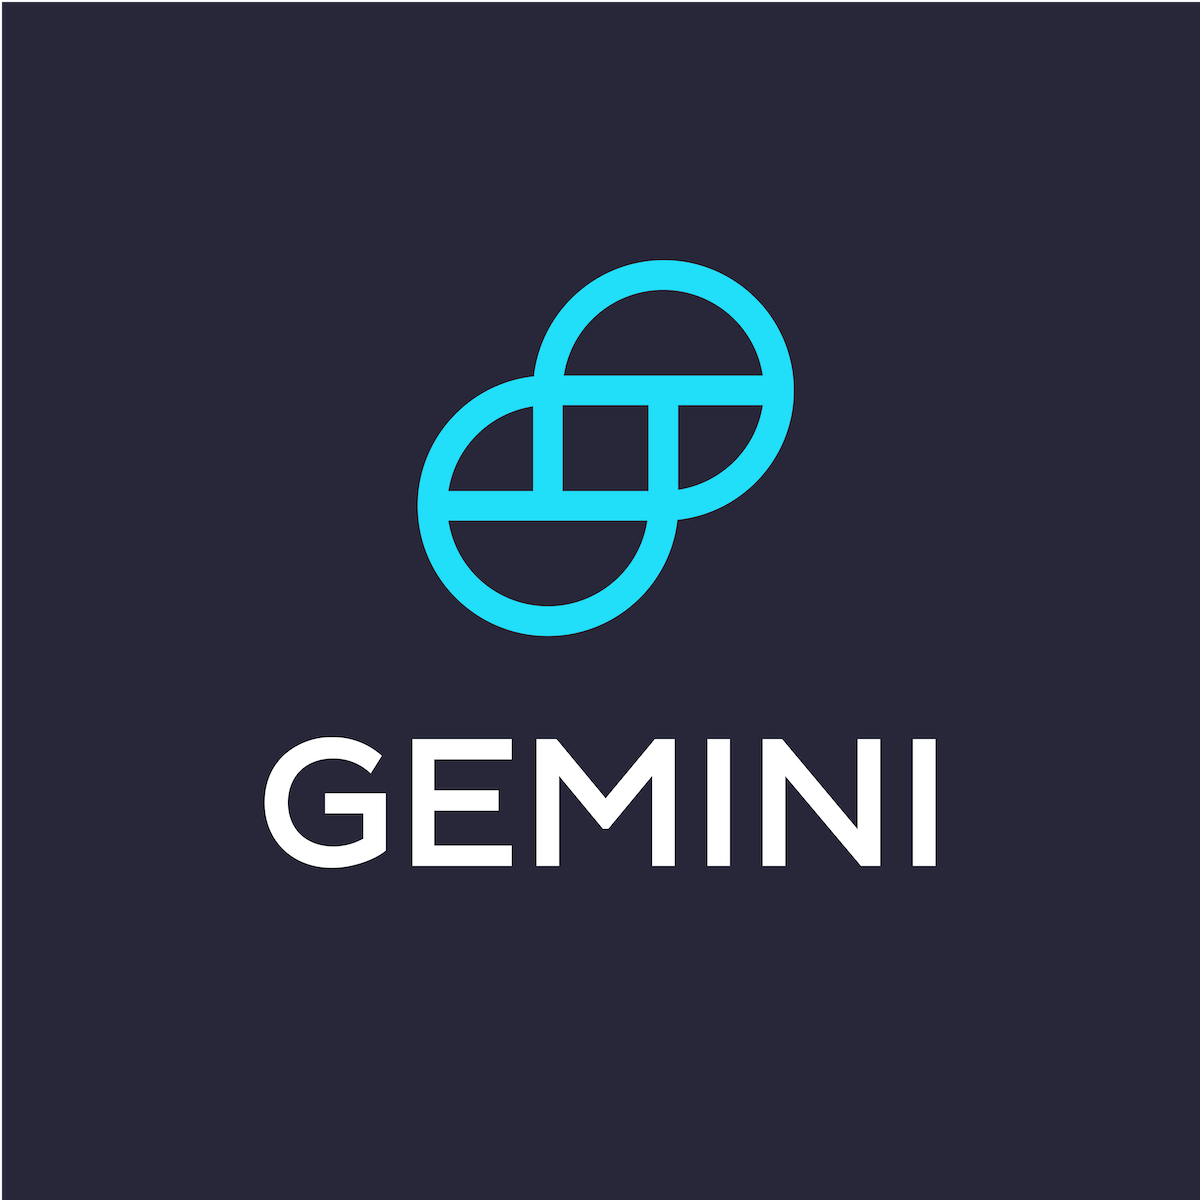 Gemini Cryptocurrency Logo